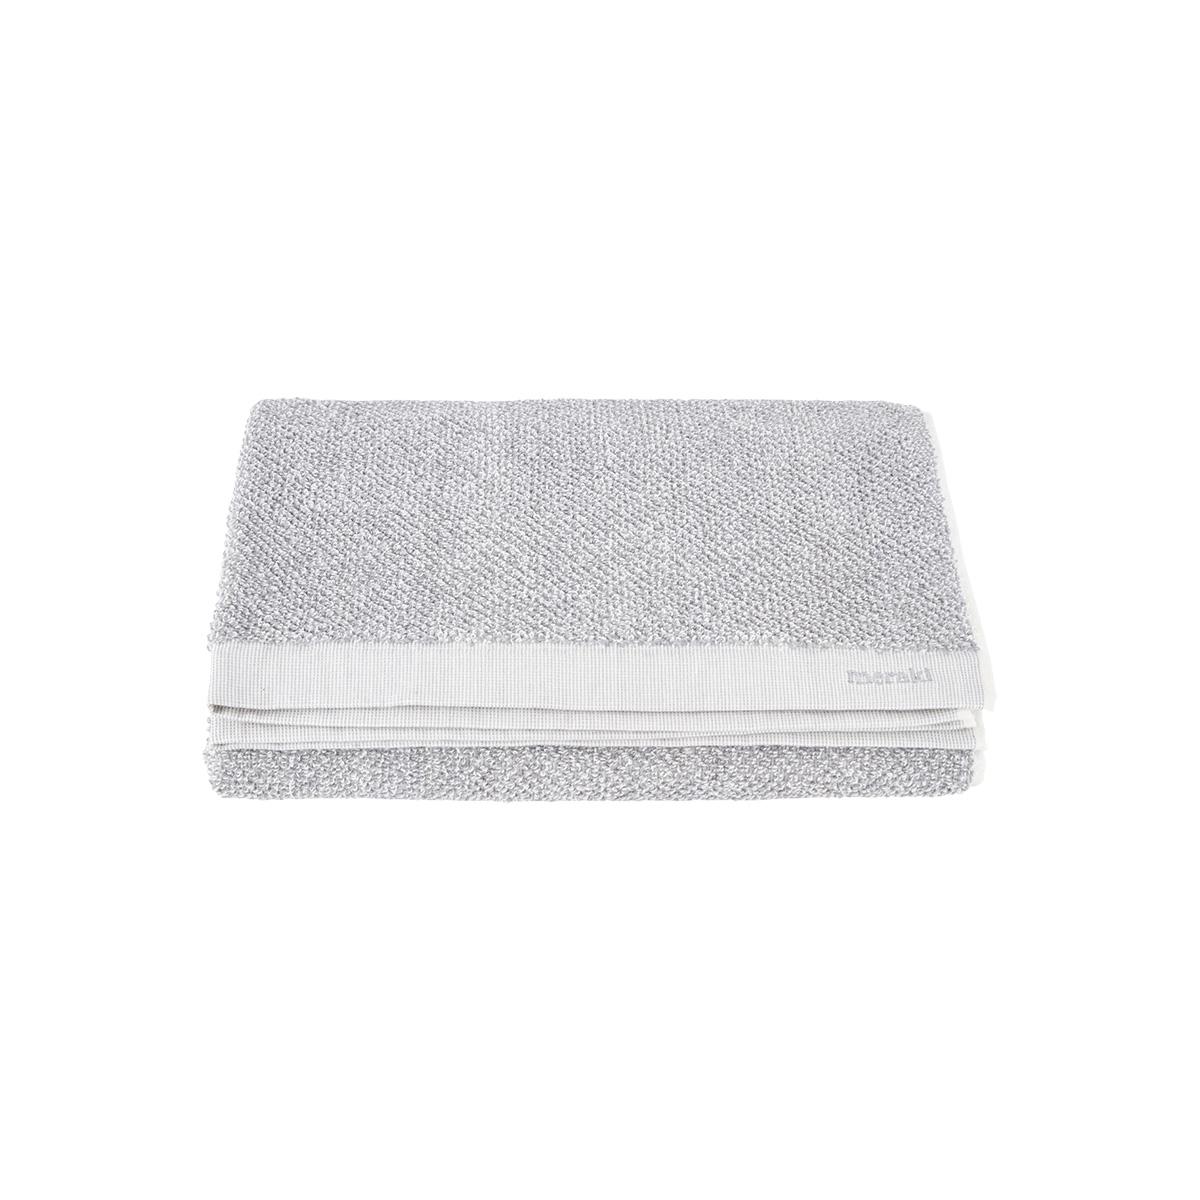 Image of   Meraki Håndklæde, hvid/grå, pakke m. 1 stk. 70x140 cm, 100%